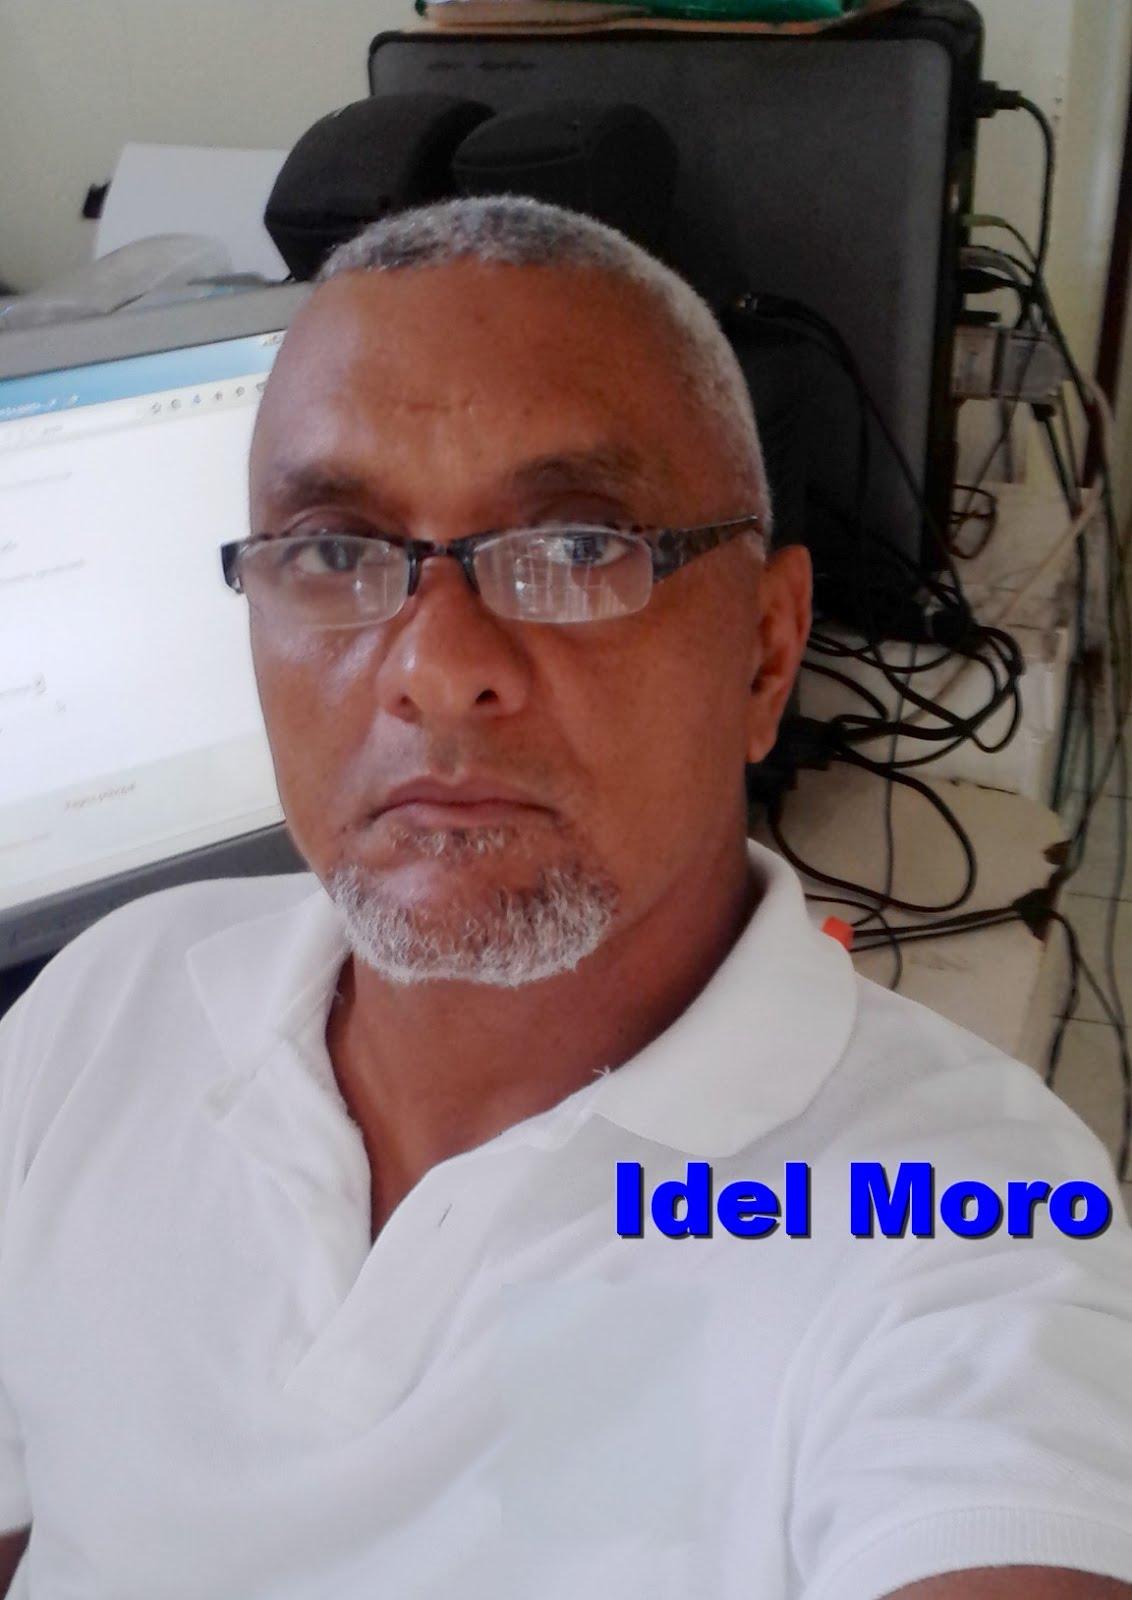 Idel Moro